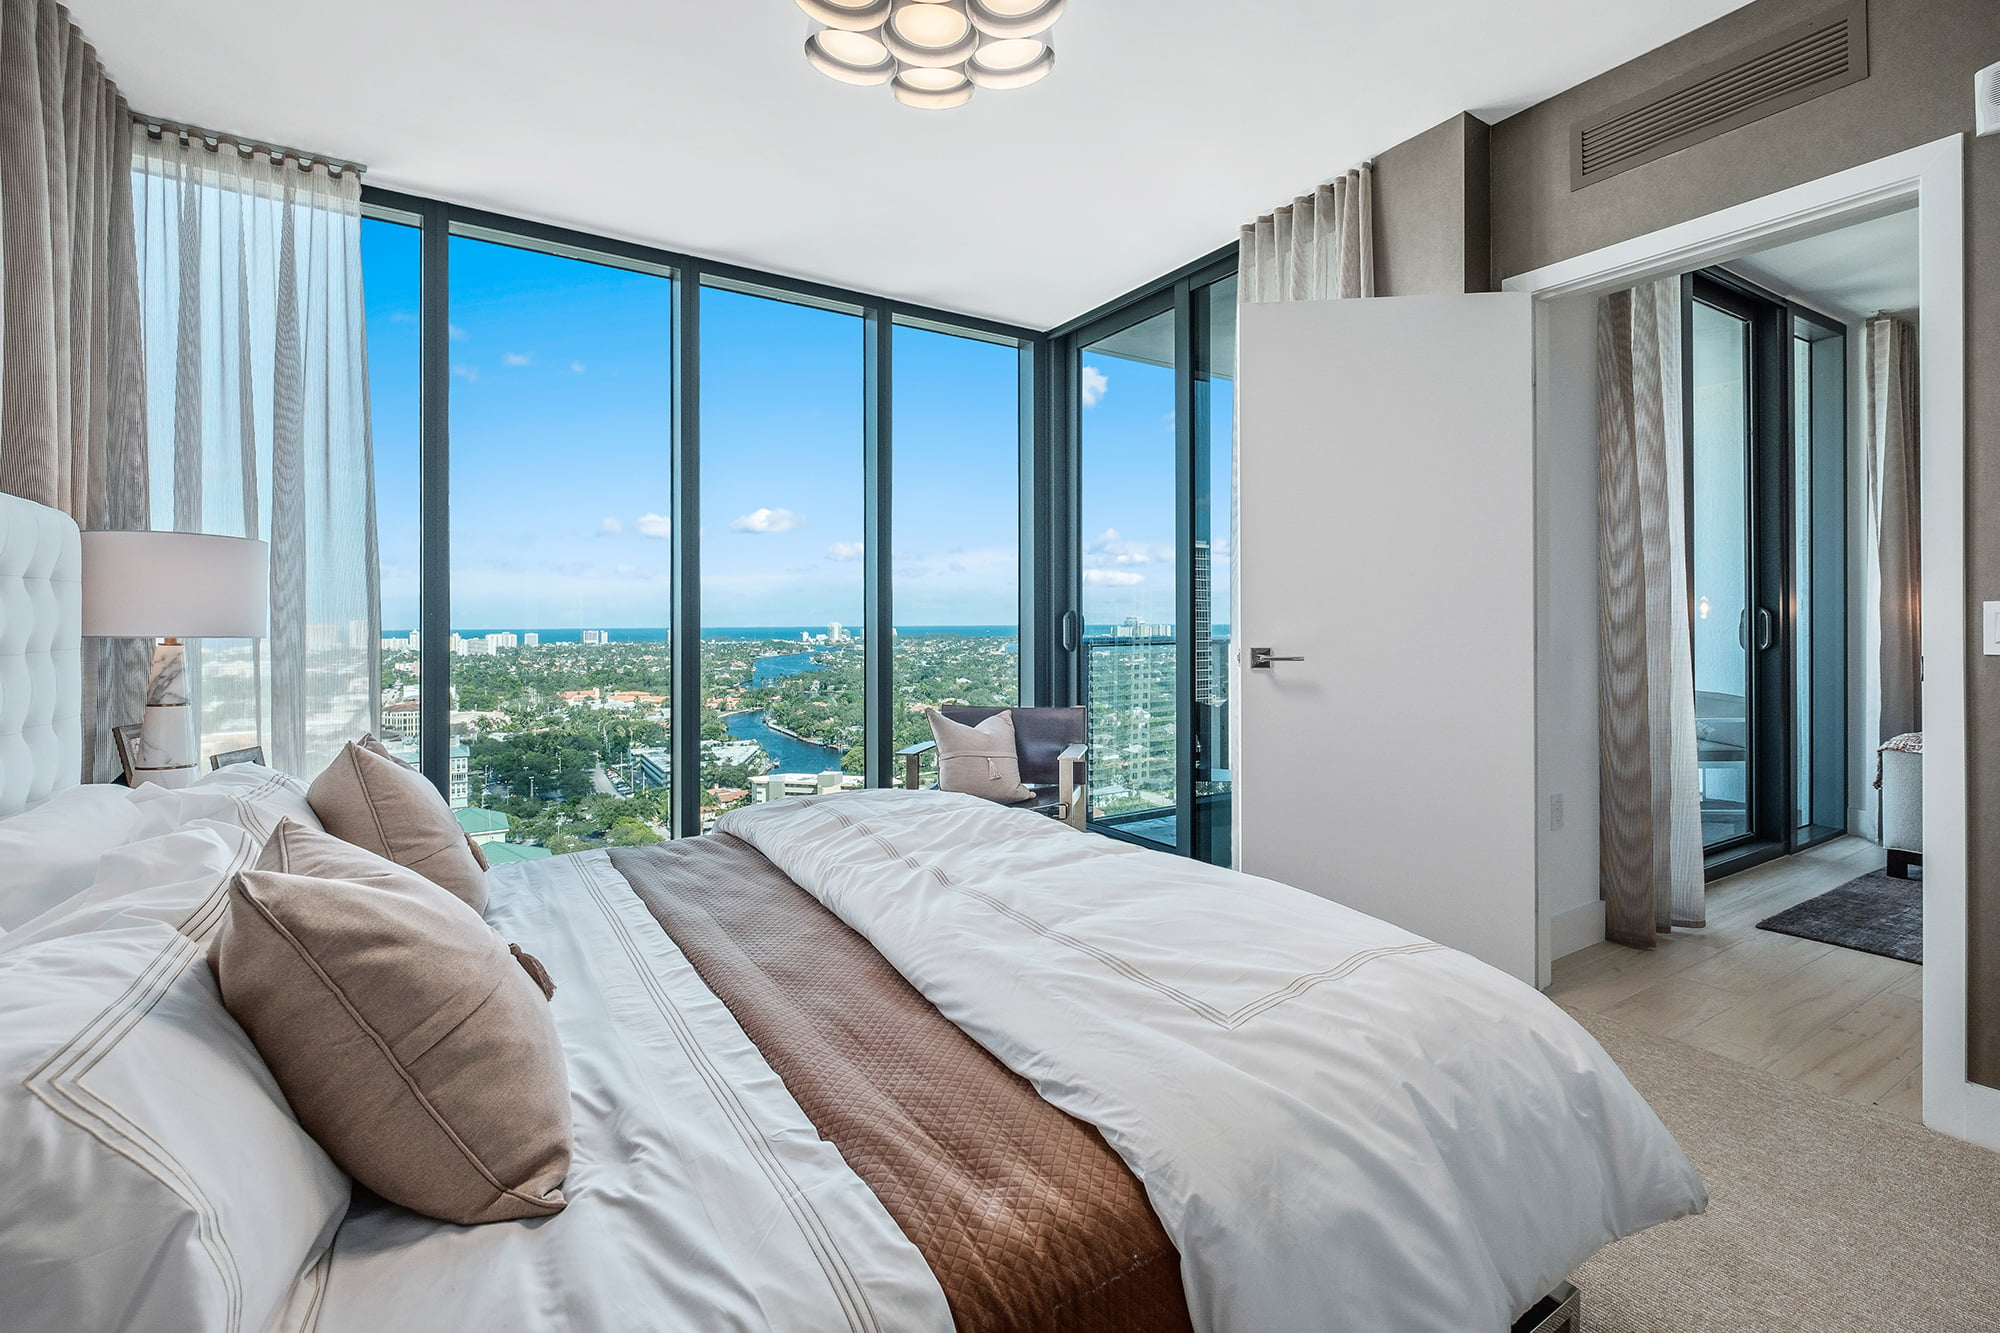 model bedroom with sky view